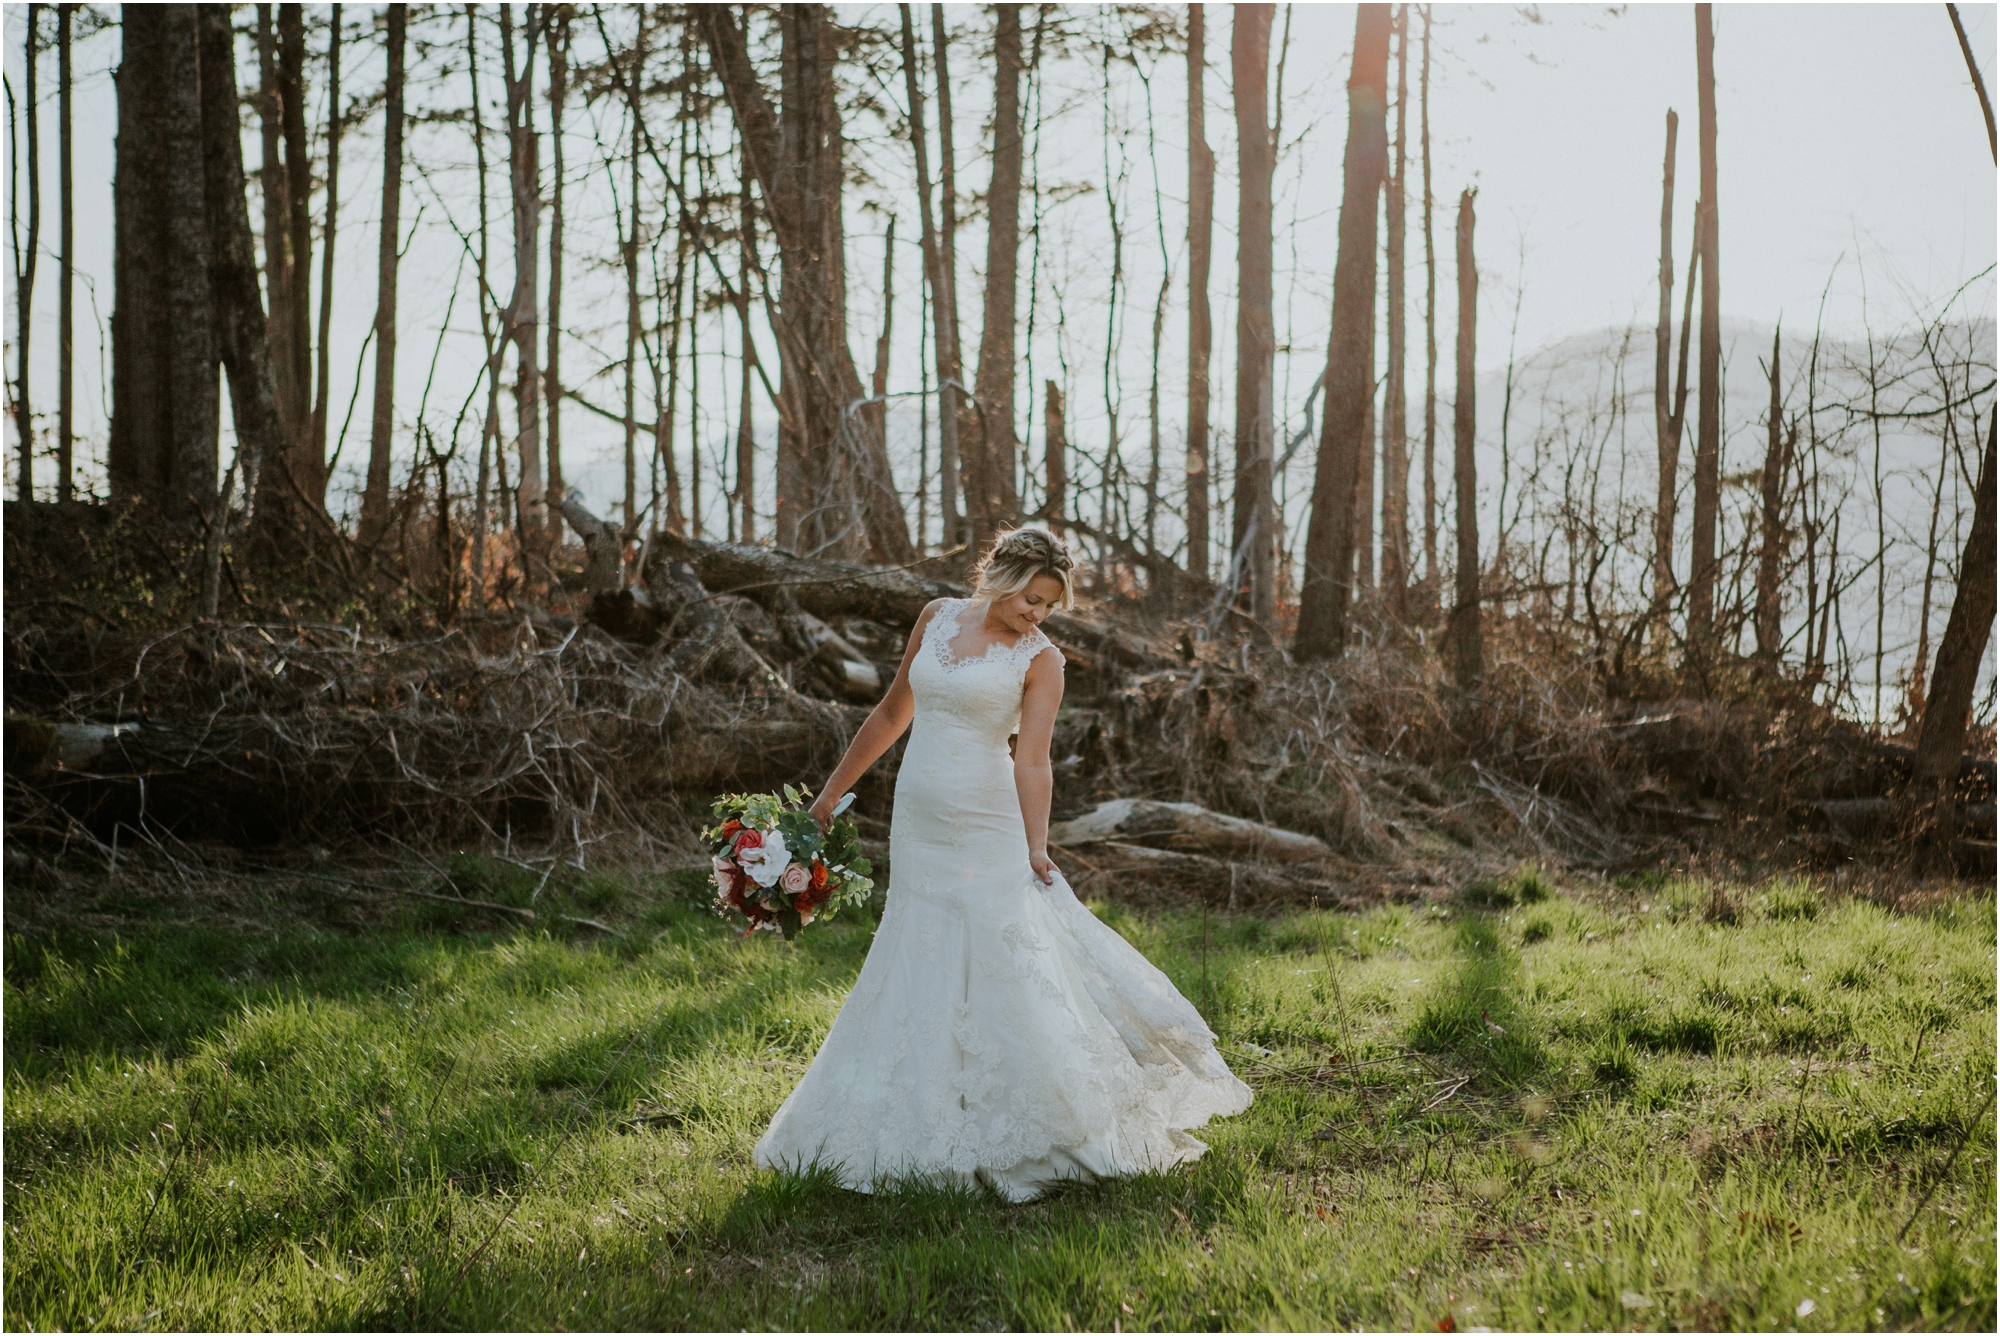 watauga-lake--bohemian-bridal-styled-session-northeast-tennessee-wedding-elopement-photography_0007.jpg